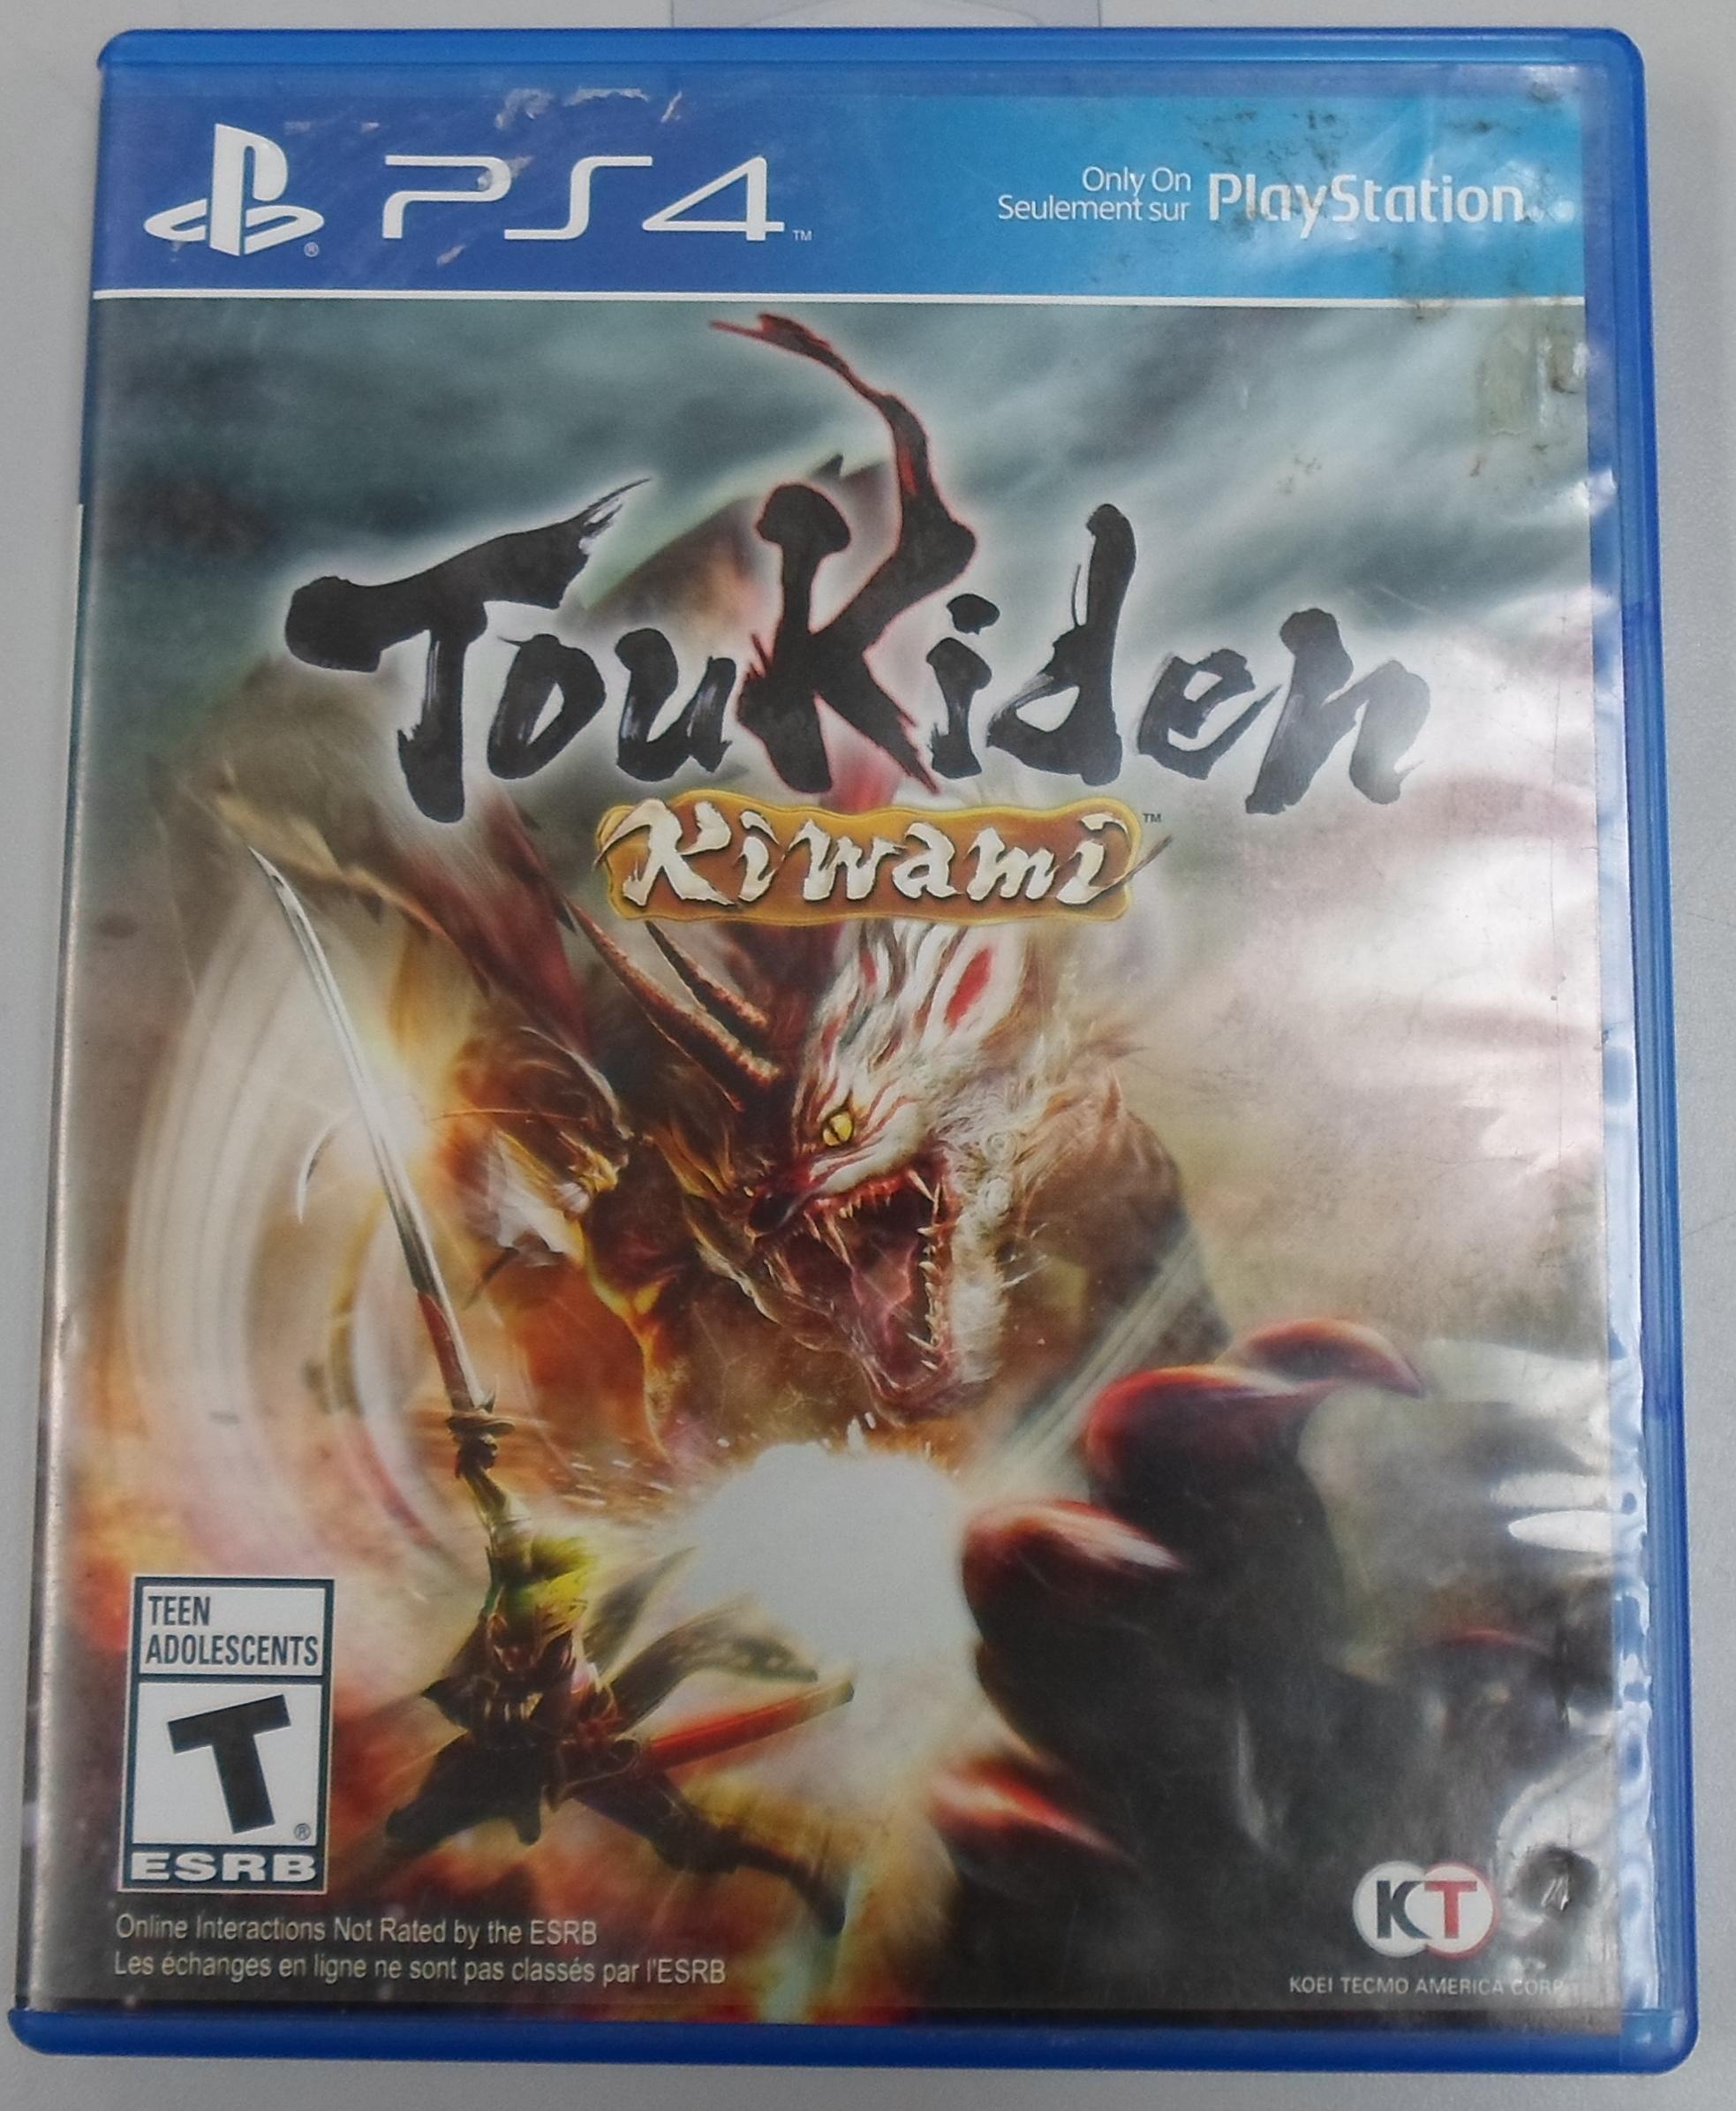 TOUKIDEN KIWAMI - PS4 GAME